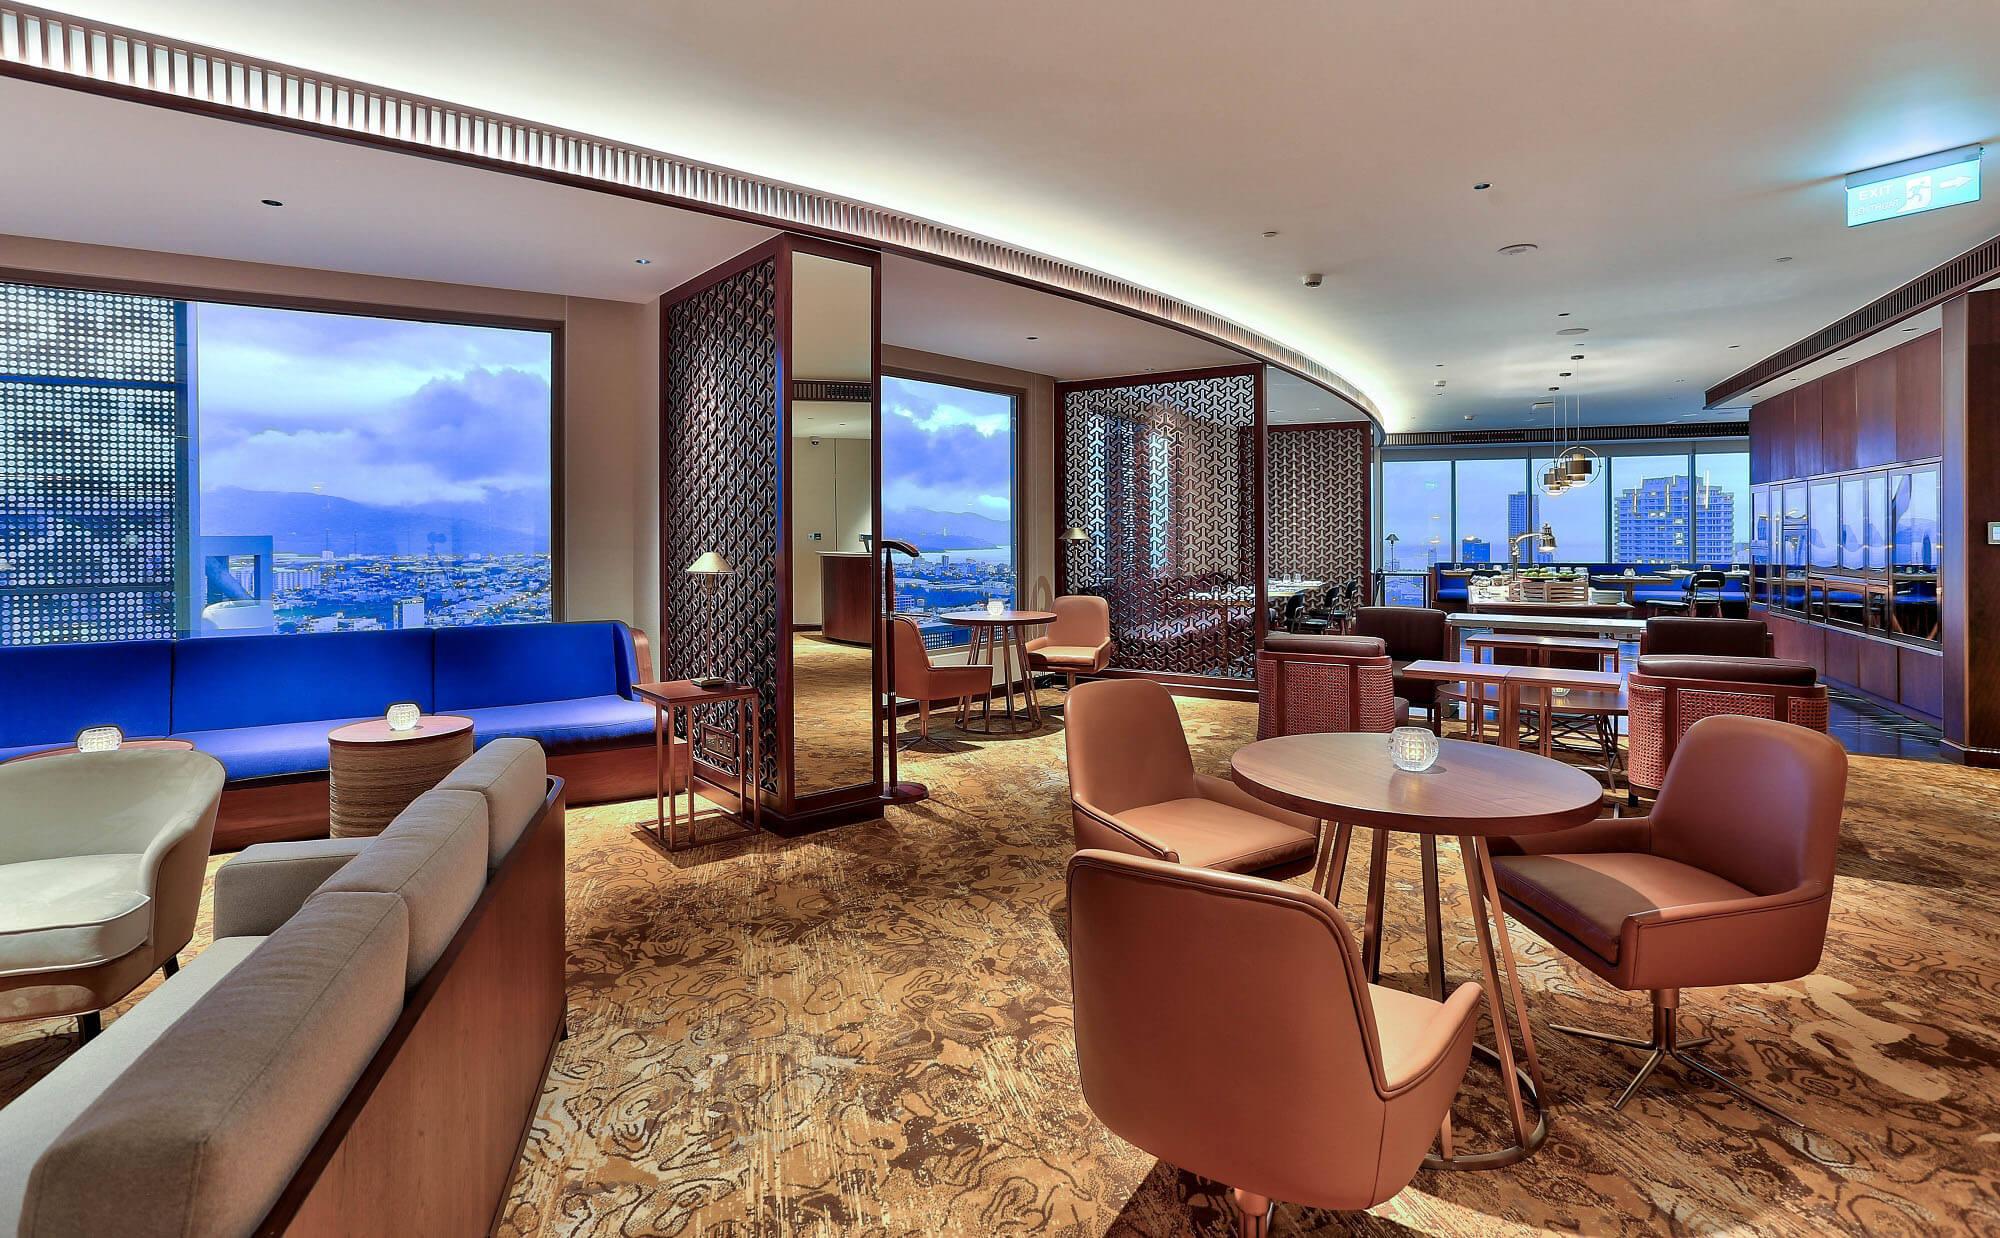 Executive Lounge Hilton Da Nang Trai Nghiem Khach San Day Phong Cach Giua Long Thanh Pho Danang Fantasticity